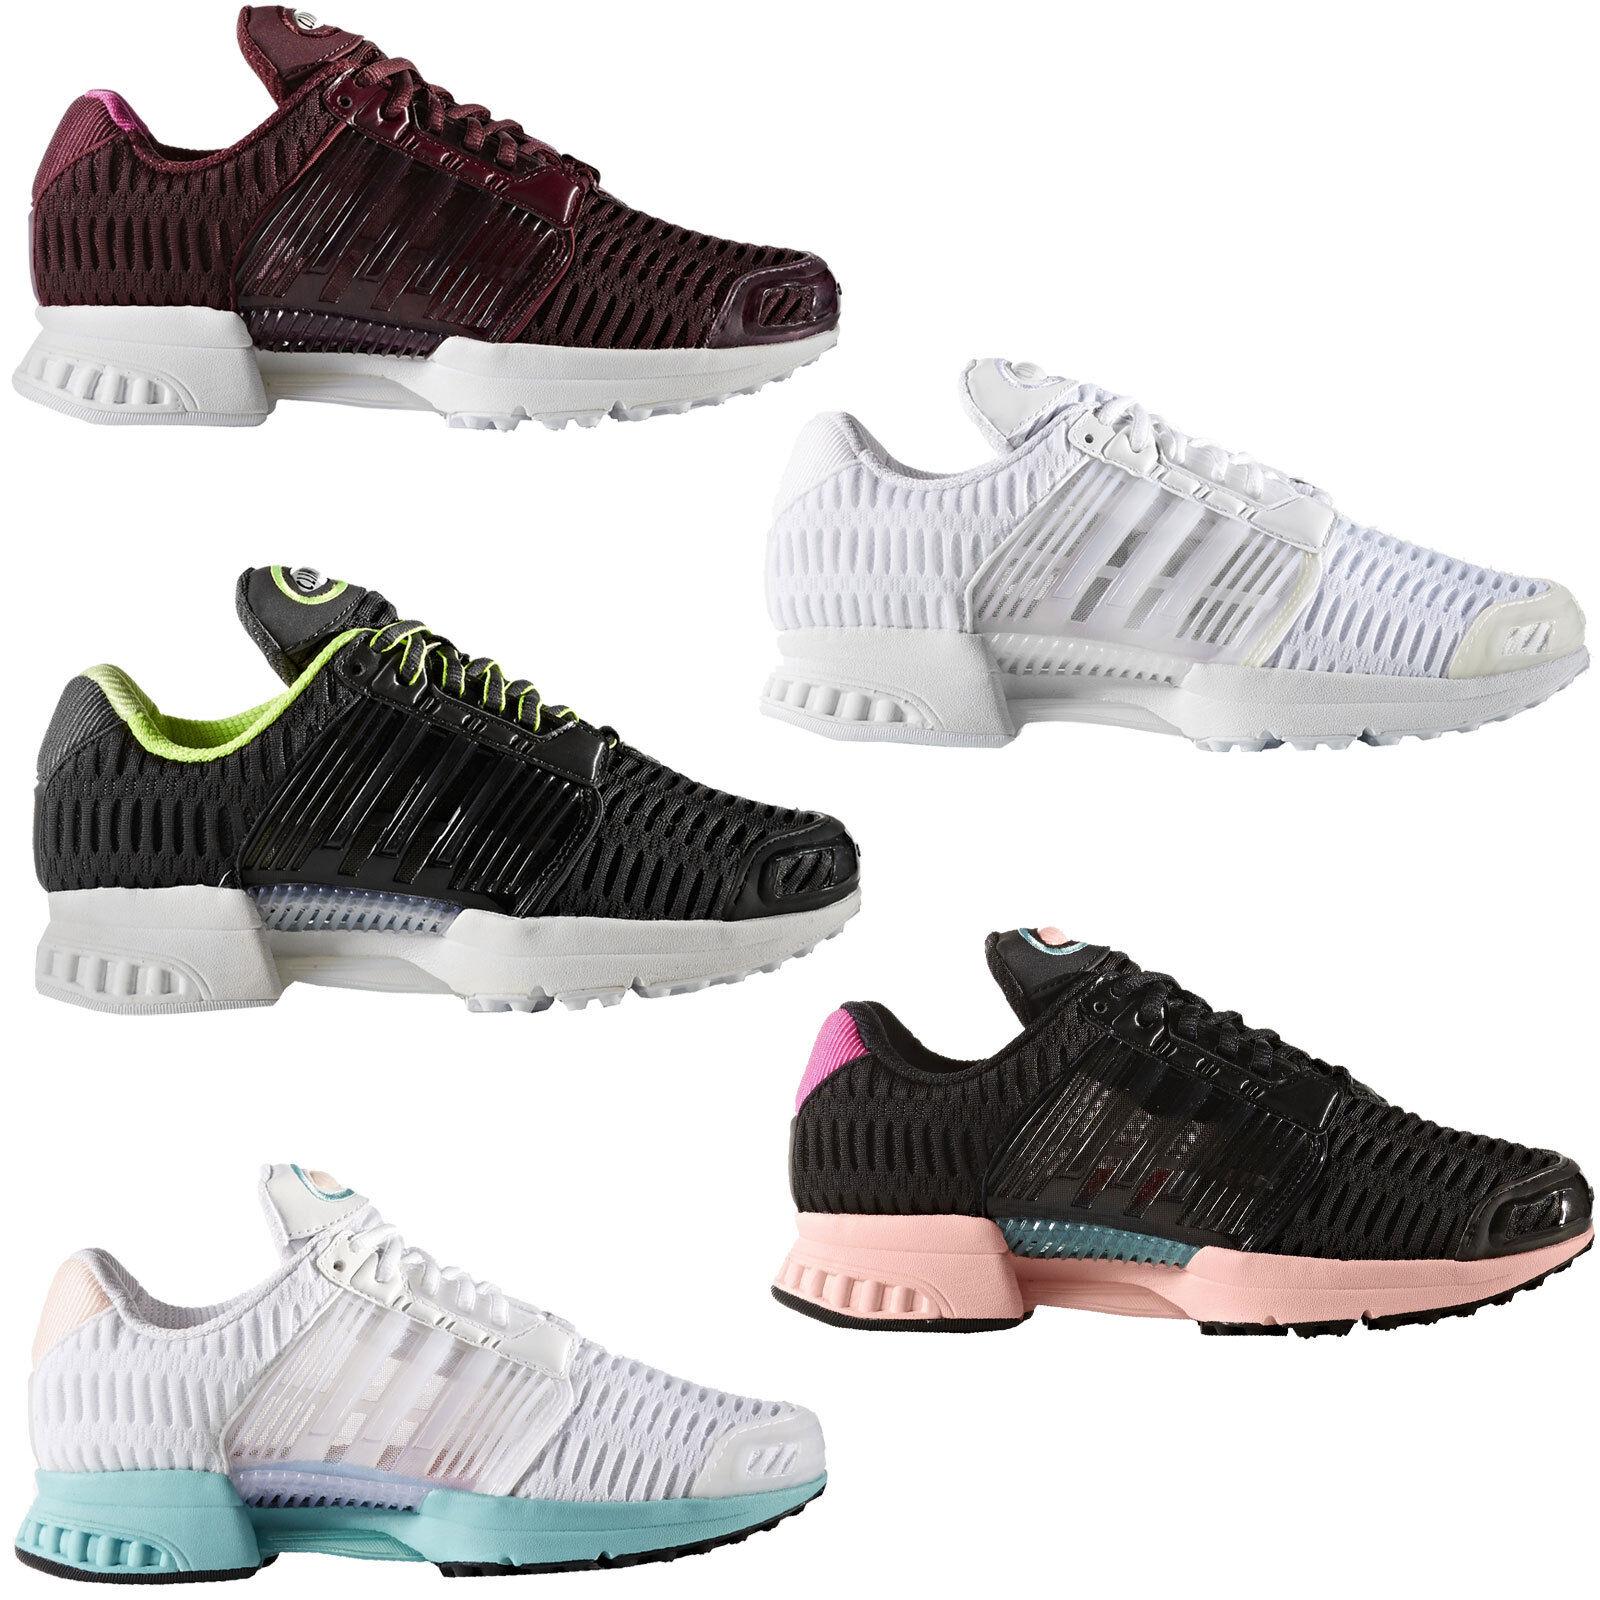 ADIDAS ORIGINALS CLIMA COOL 1 Damenschuhe Climacool Sneaker für Kinder